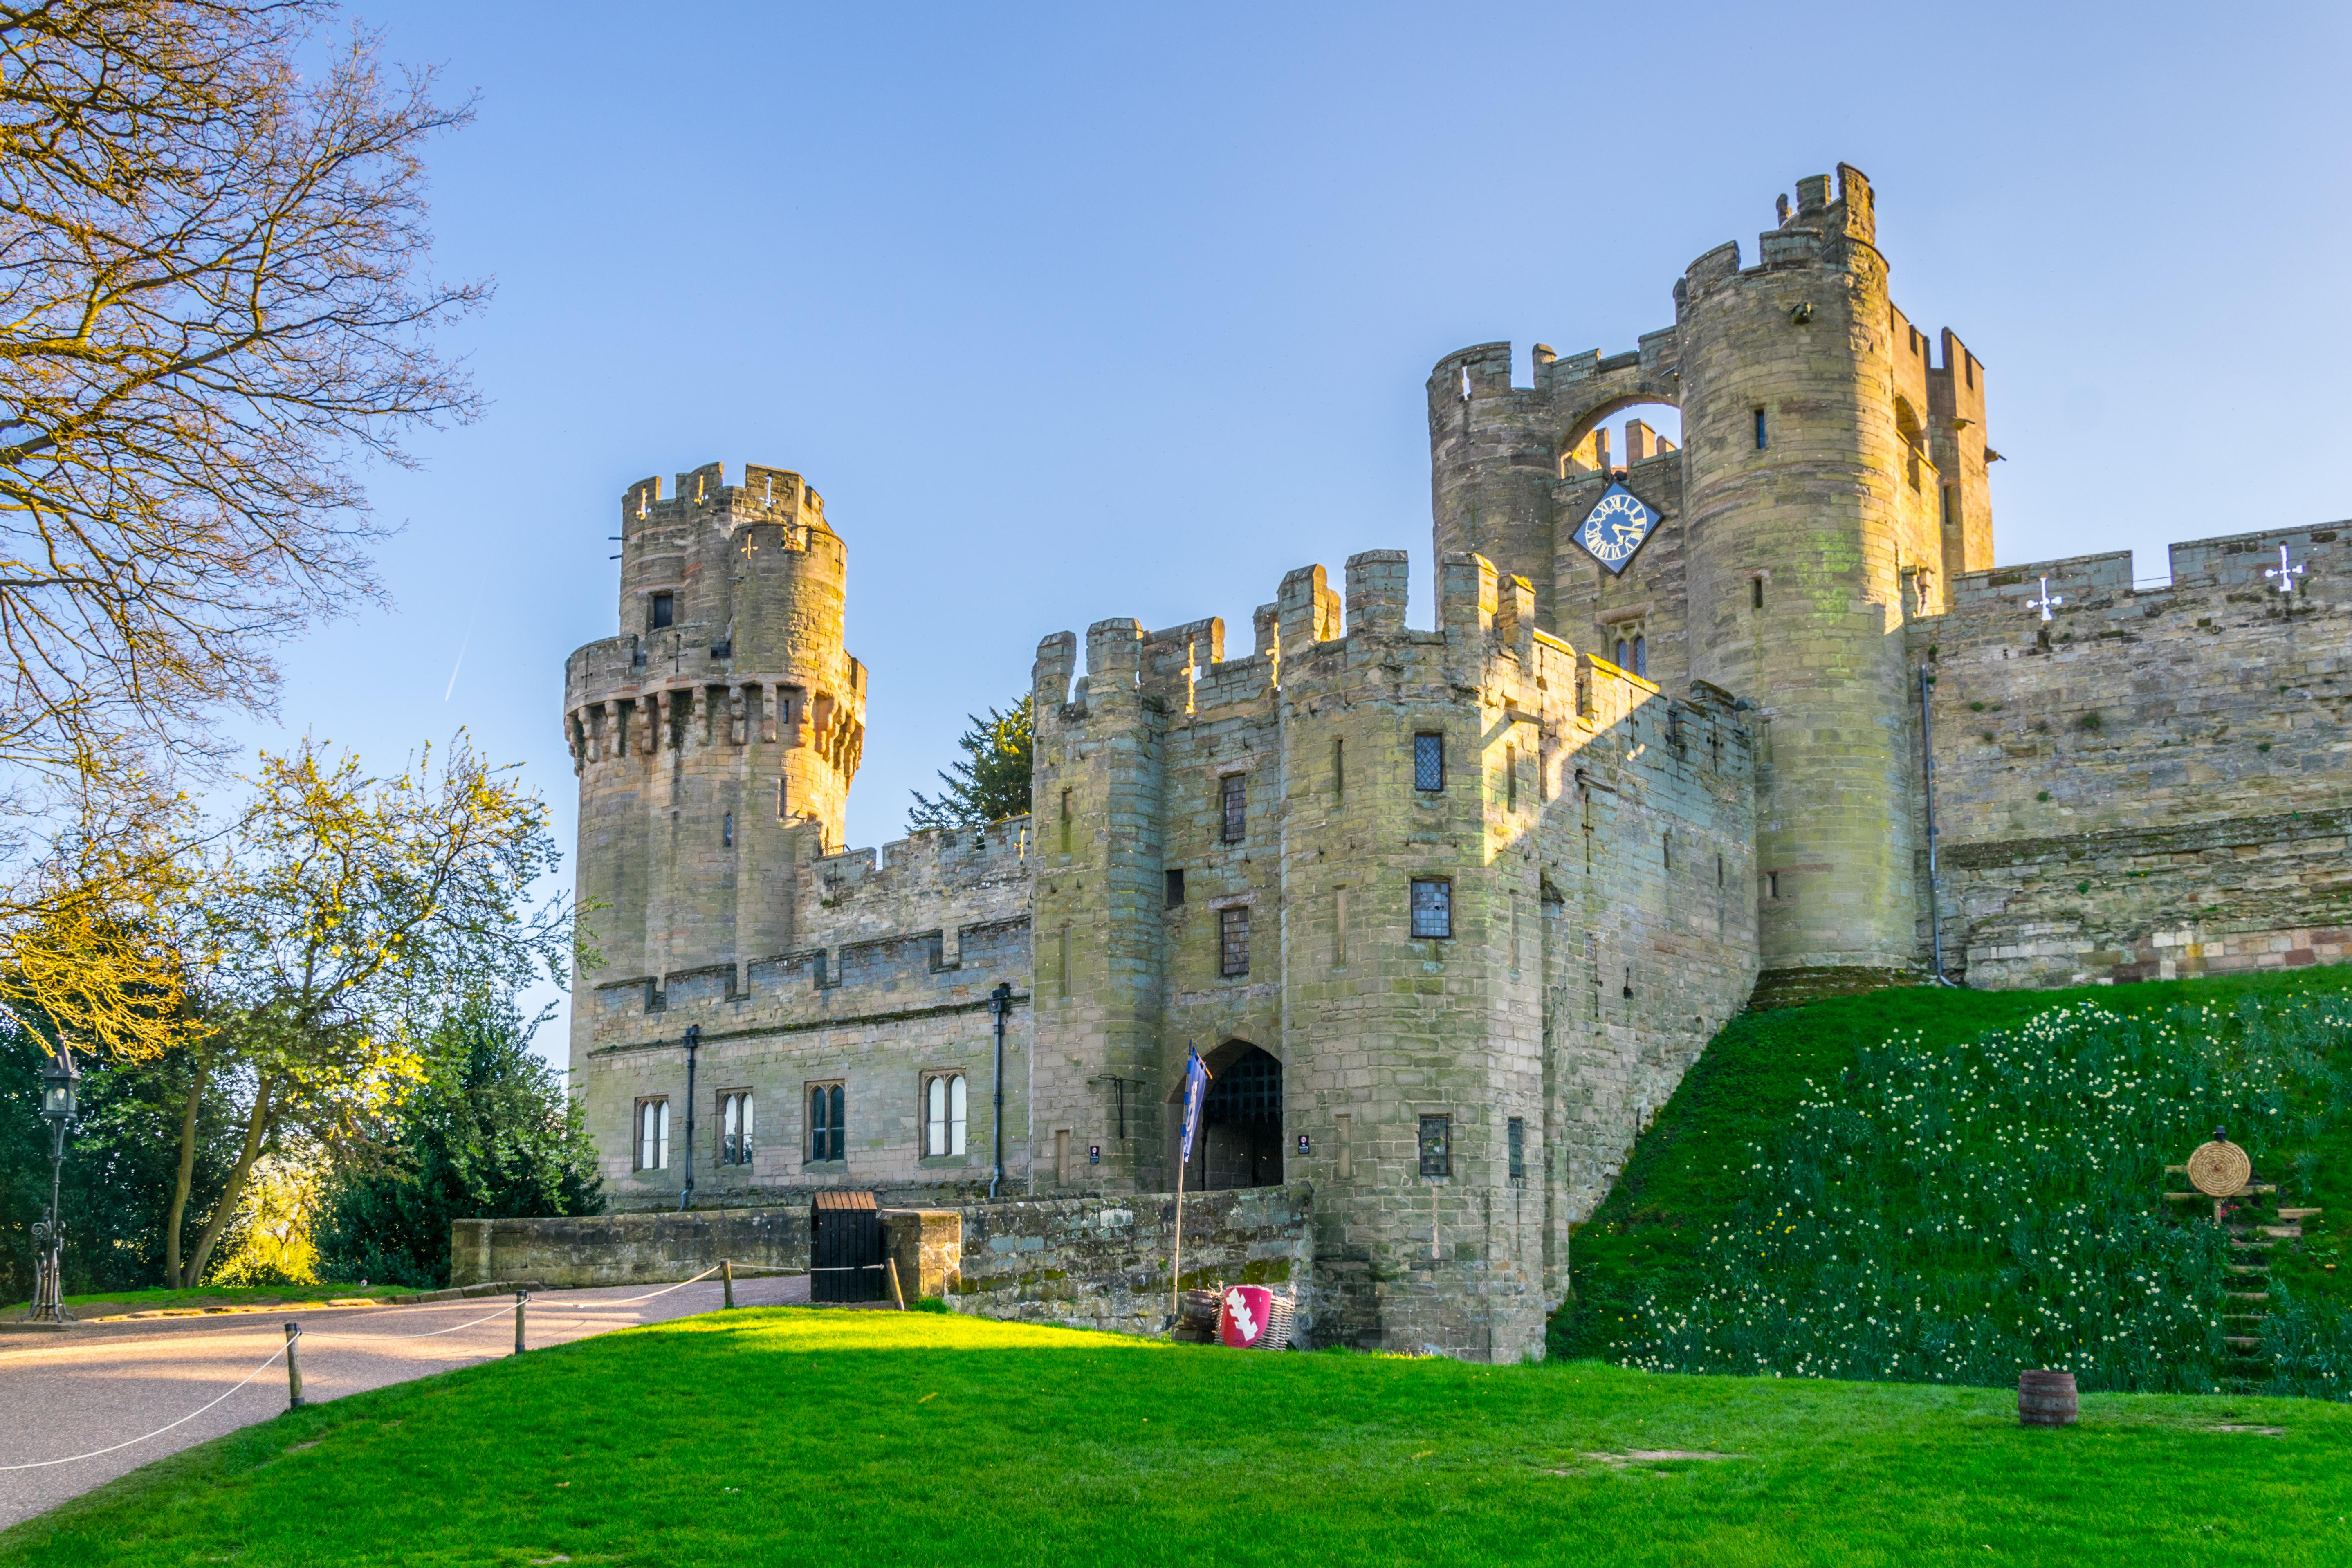 most impressive castles warwick castle